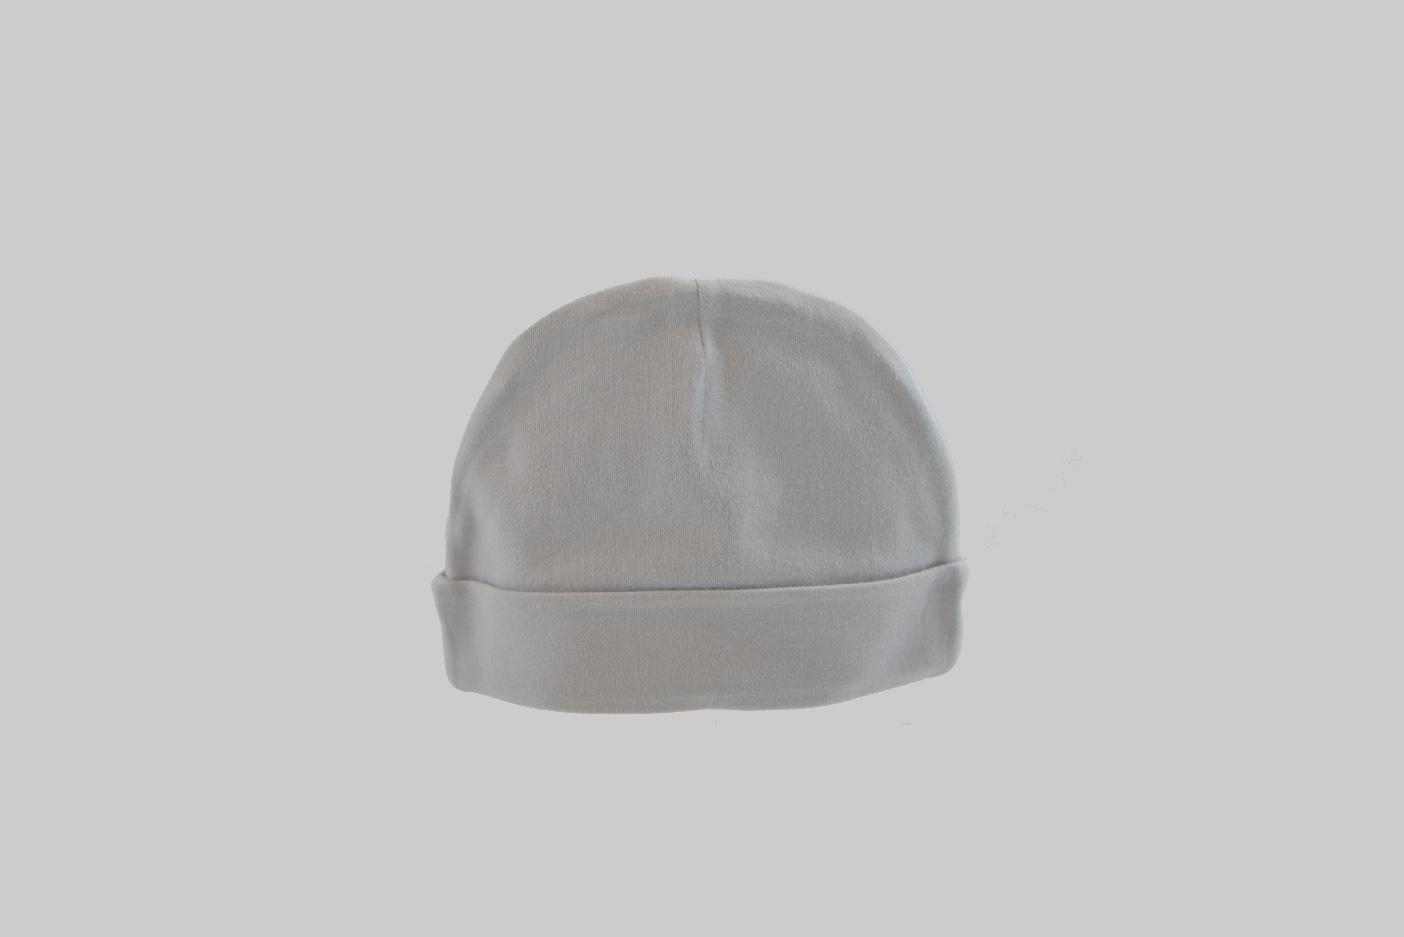 Silver Gray baby cap